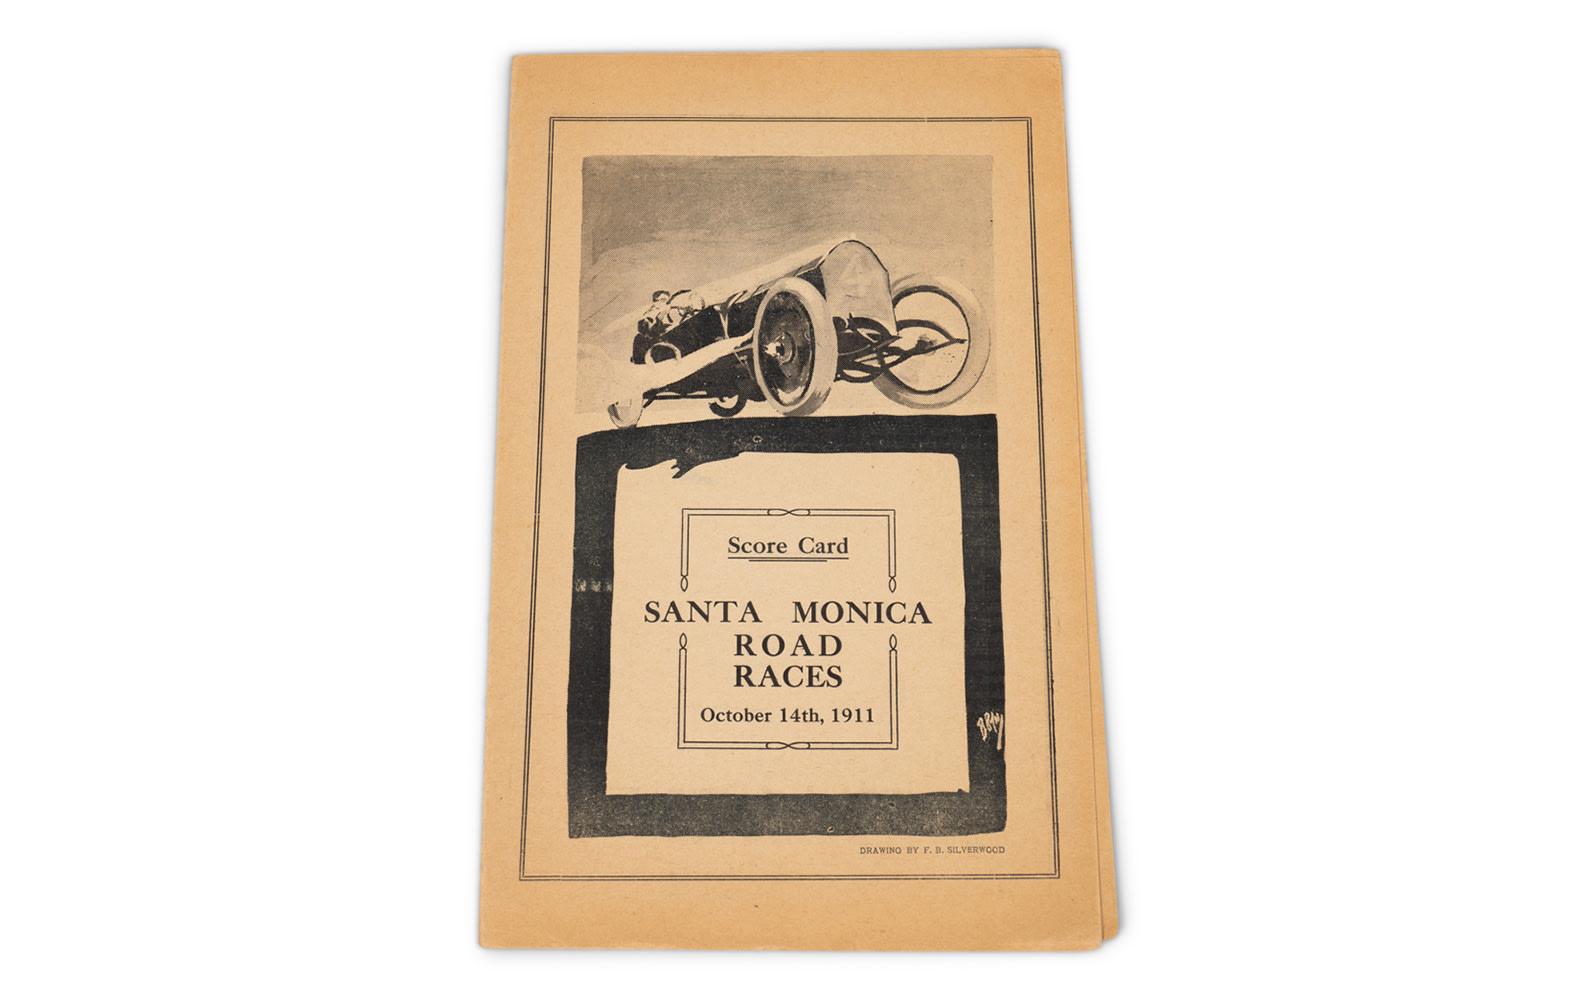 1911 Santa Monica Road Race Score Card